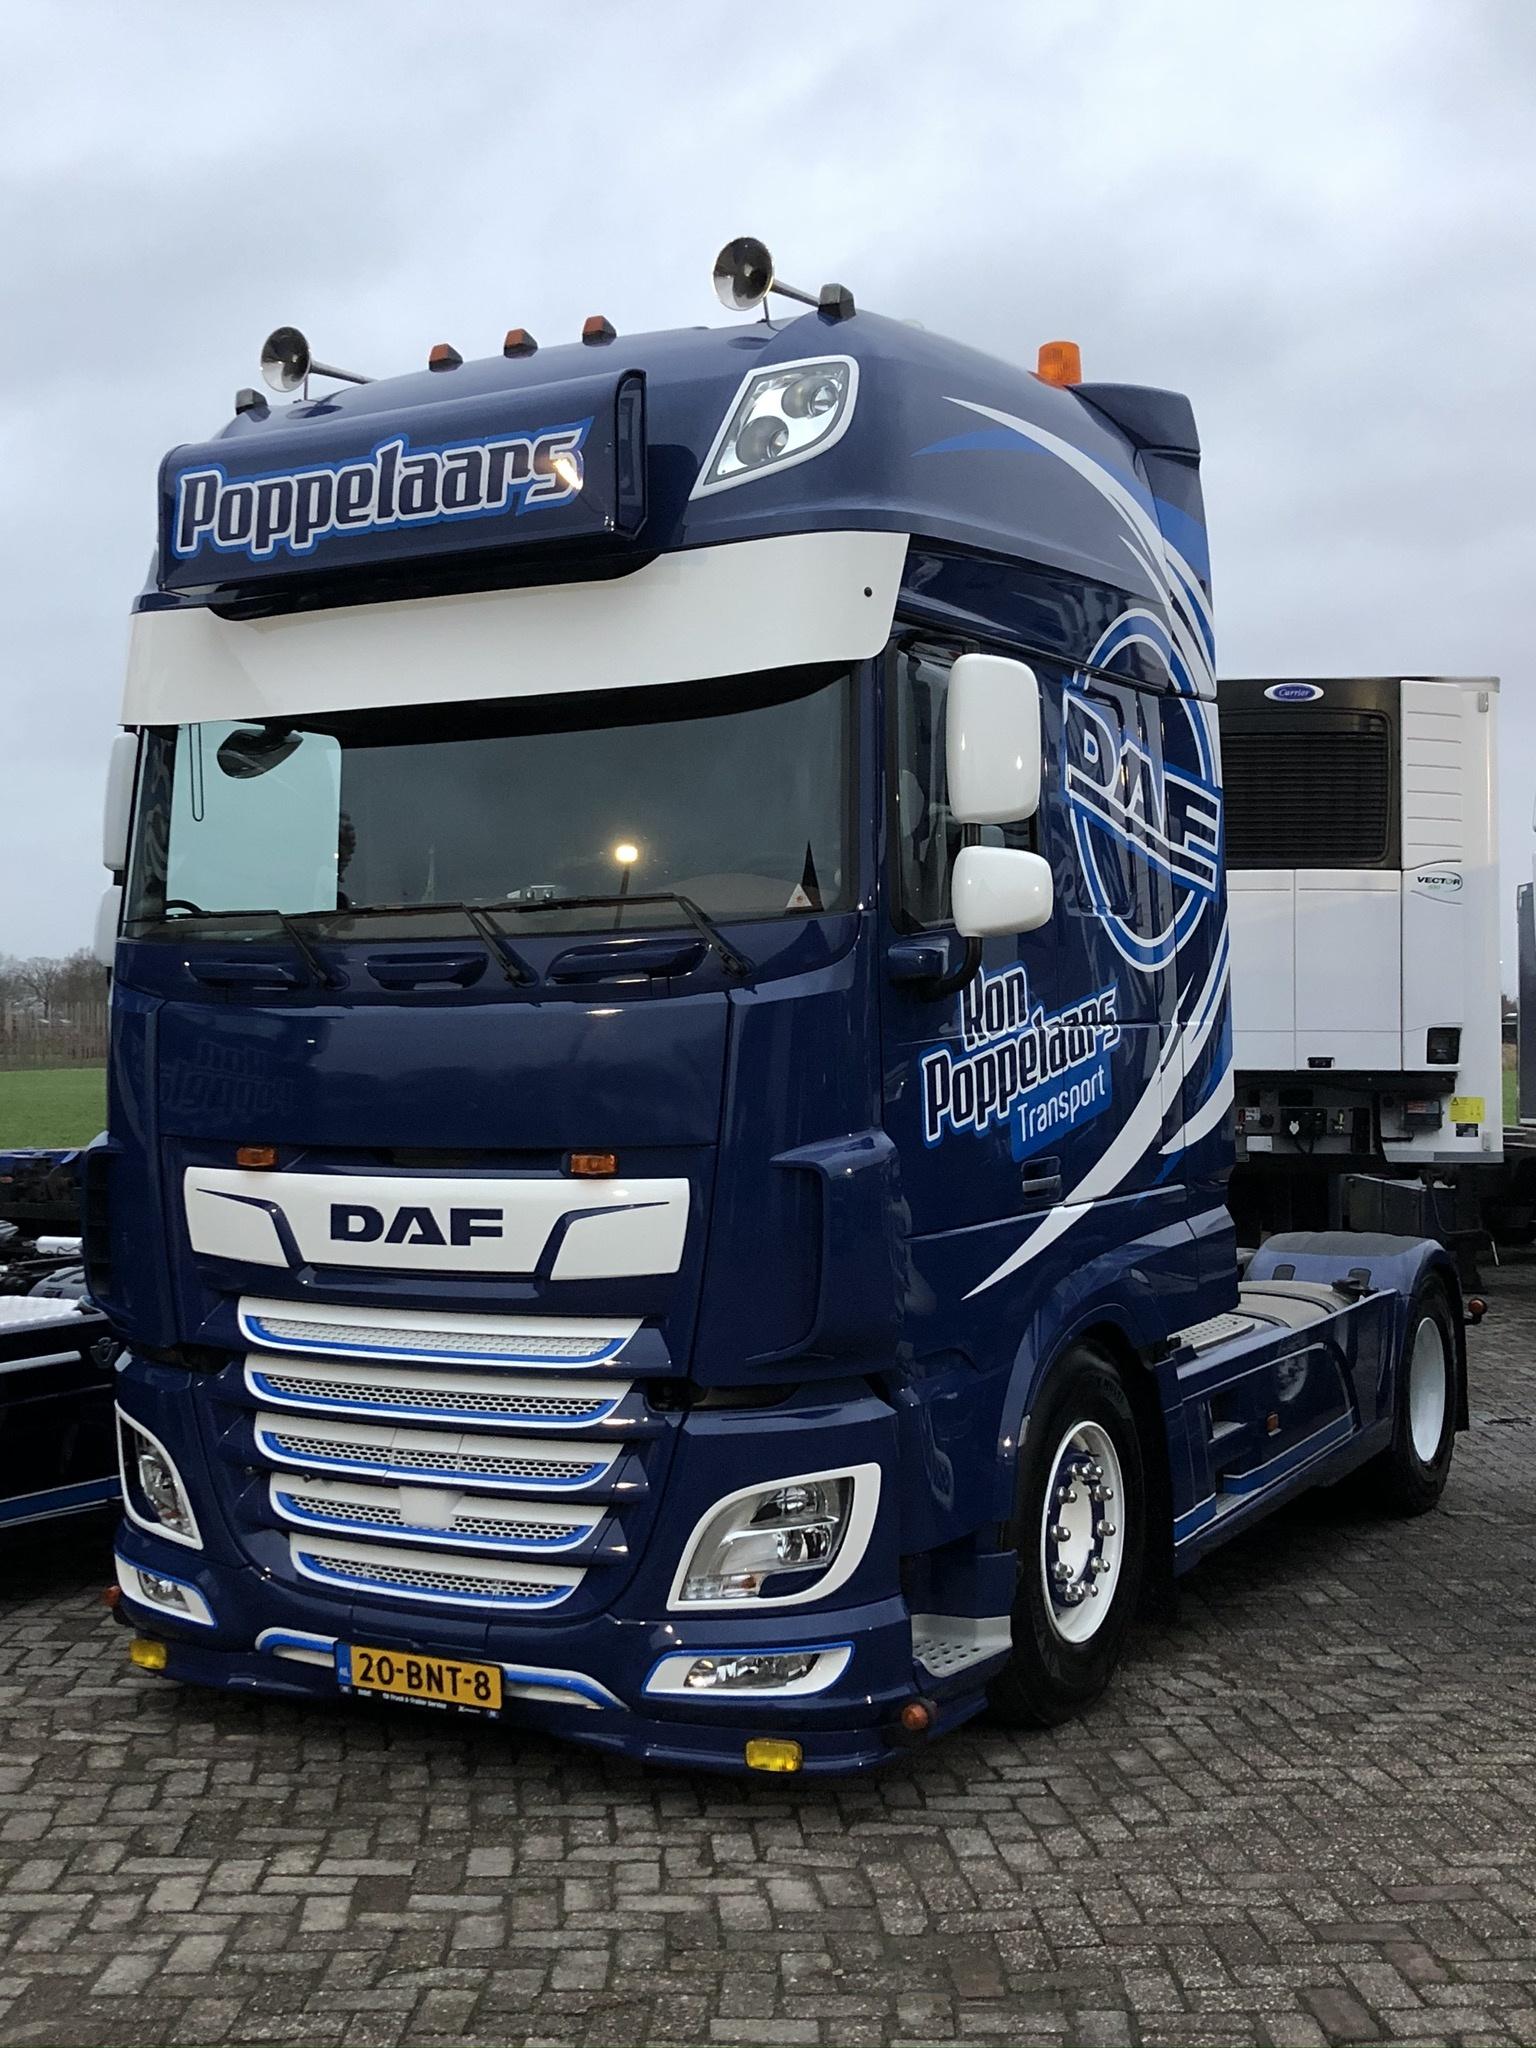 RVS Lichtbaksteunen voor DAF Super Space Cab - Go-in-Style.nl